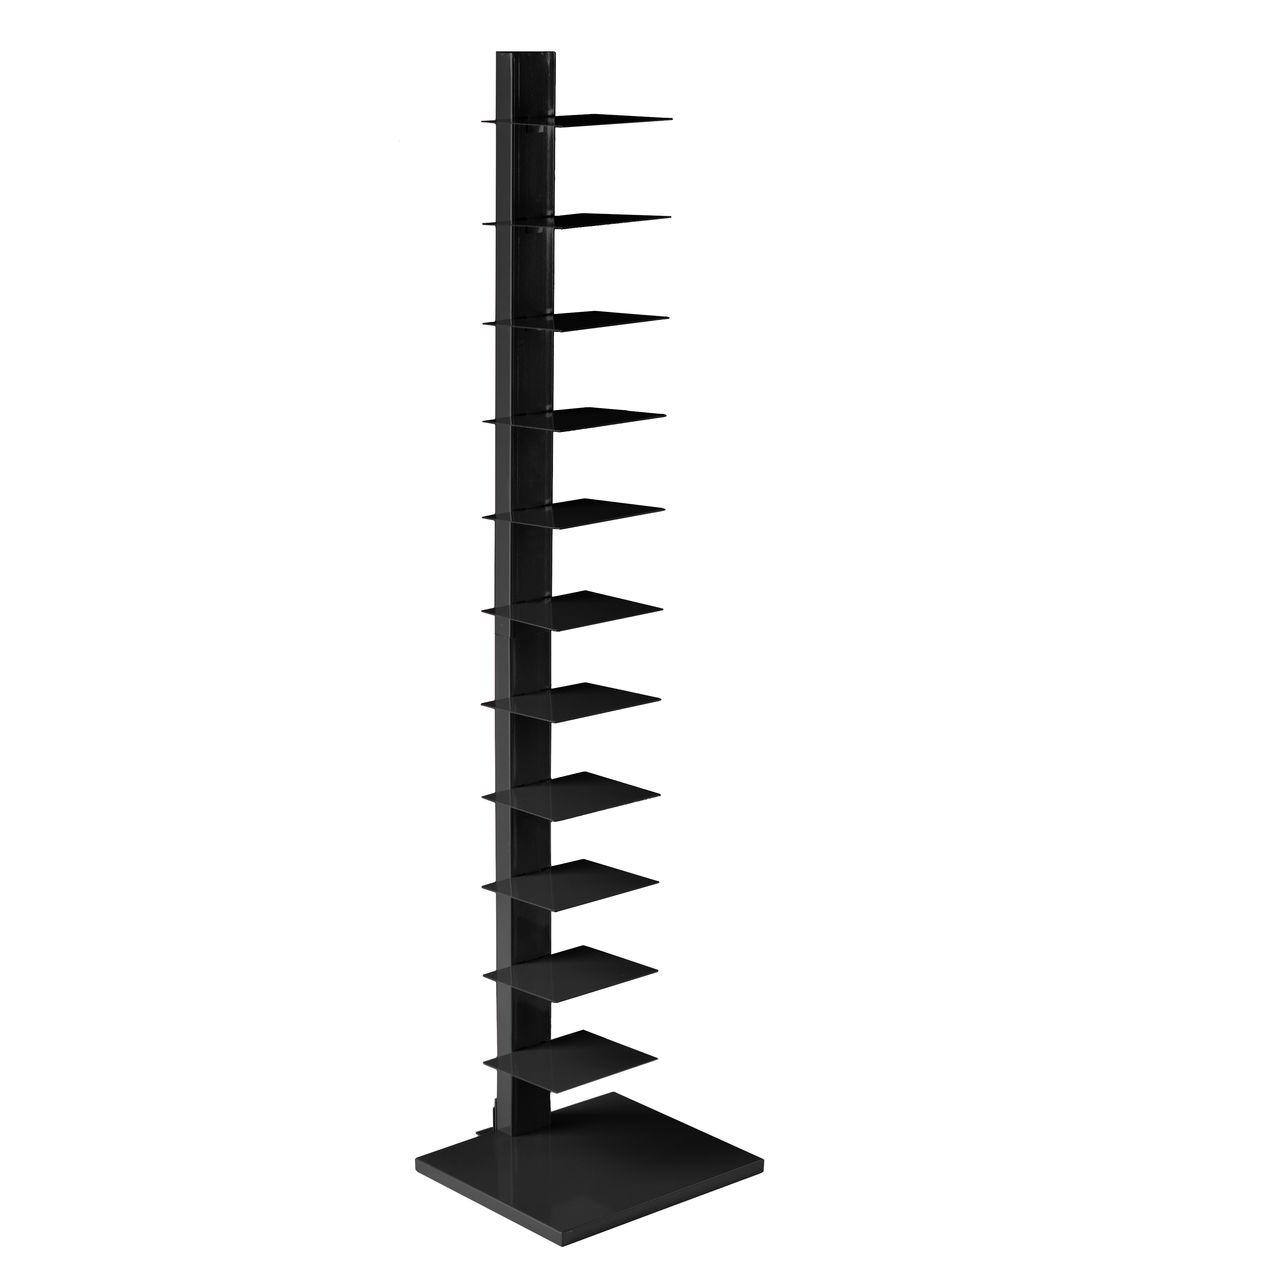 SEI Spine Tower Shelf in Black